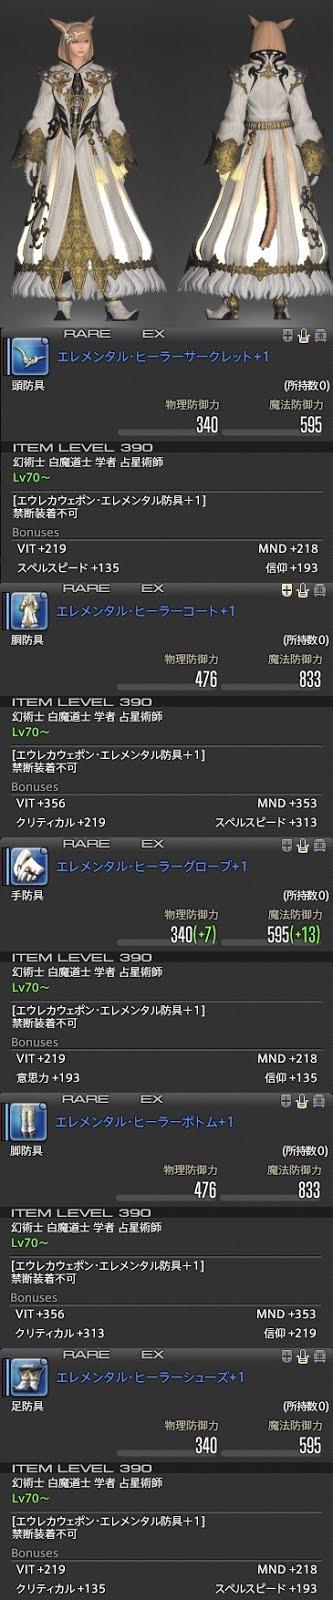 「FF14」エレメンタル・ヒーラー+1シリーズ